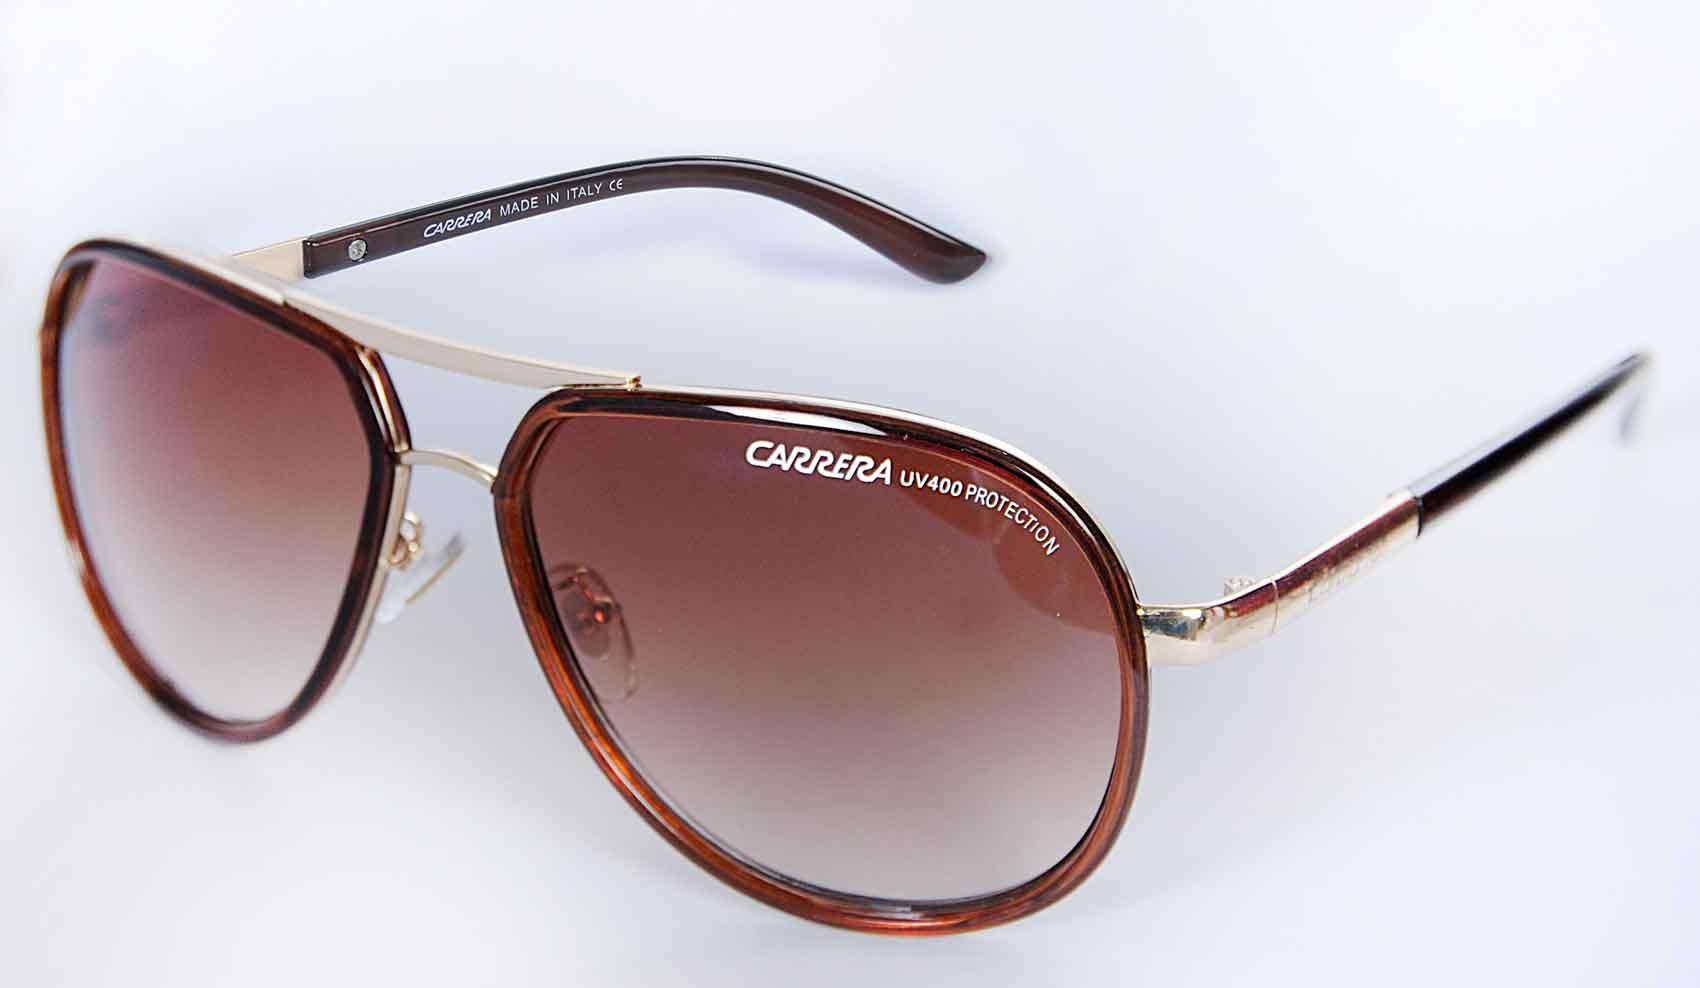 عینک مردانه آفتابی کاررا